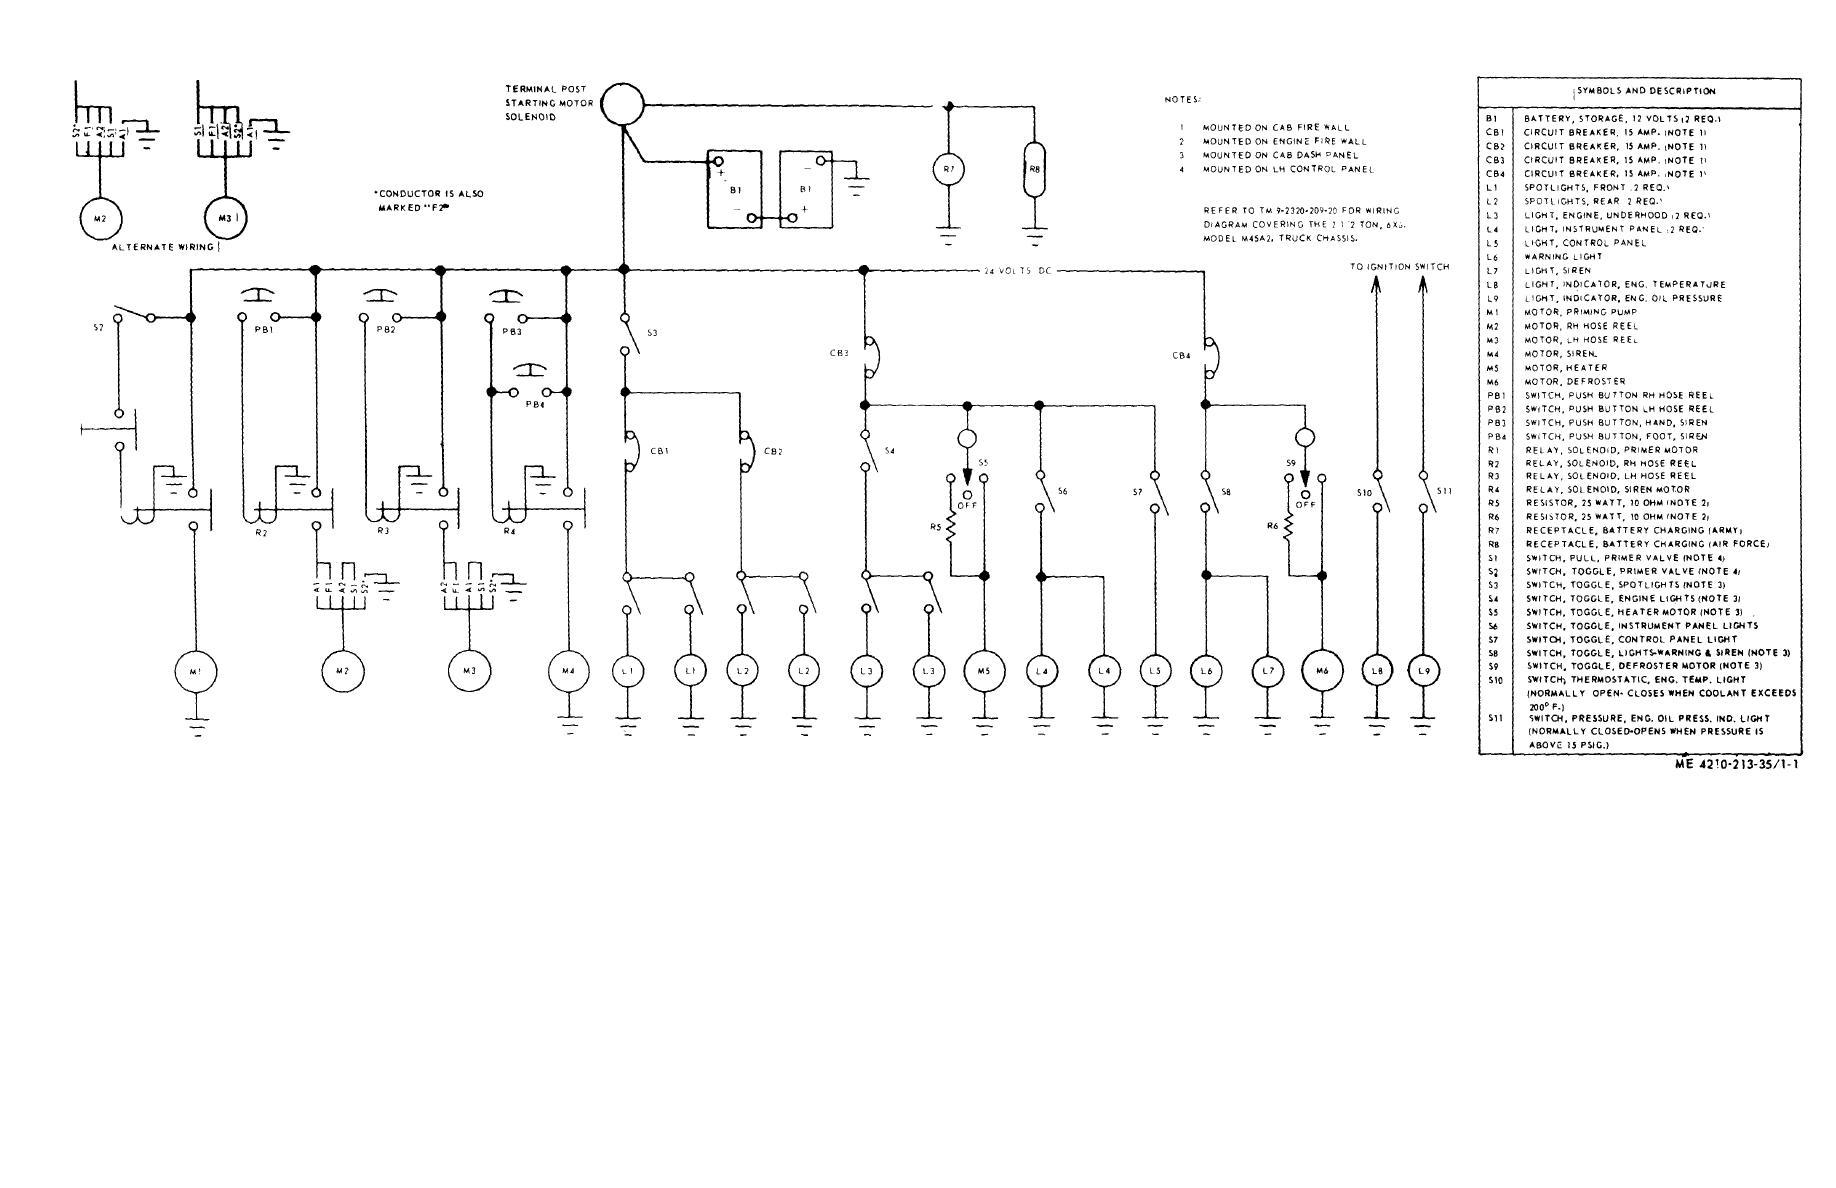 peterbilt fuse panel diagram jeep tj front suspension locations free engine